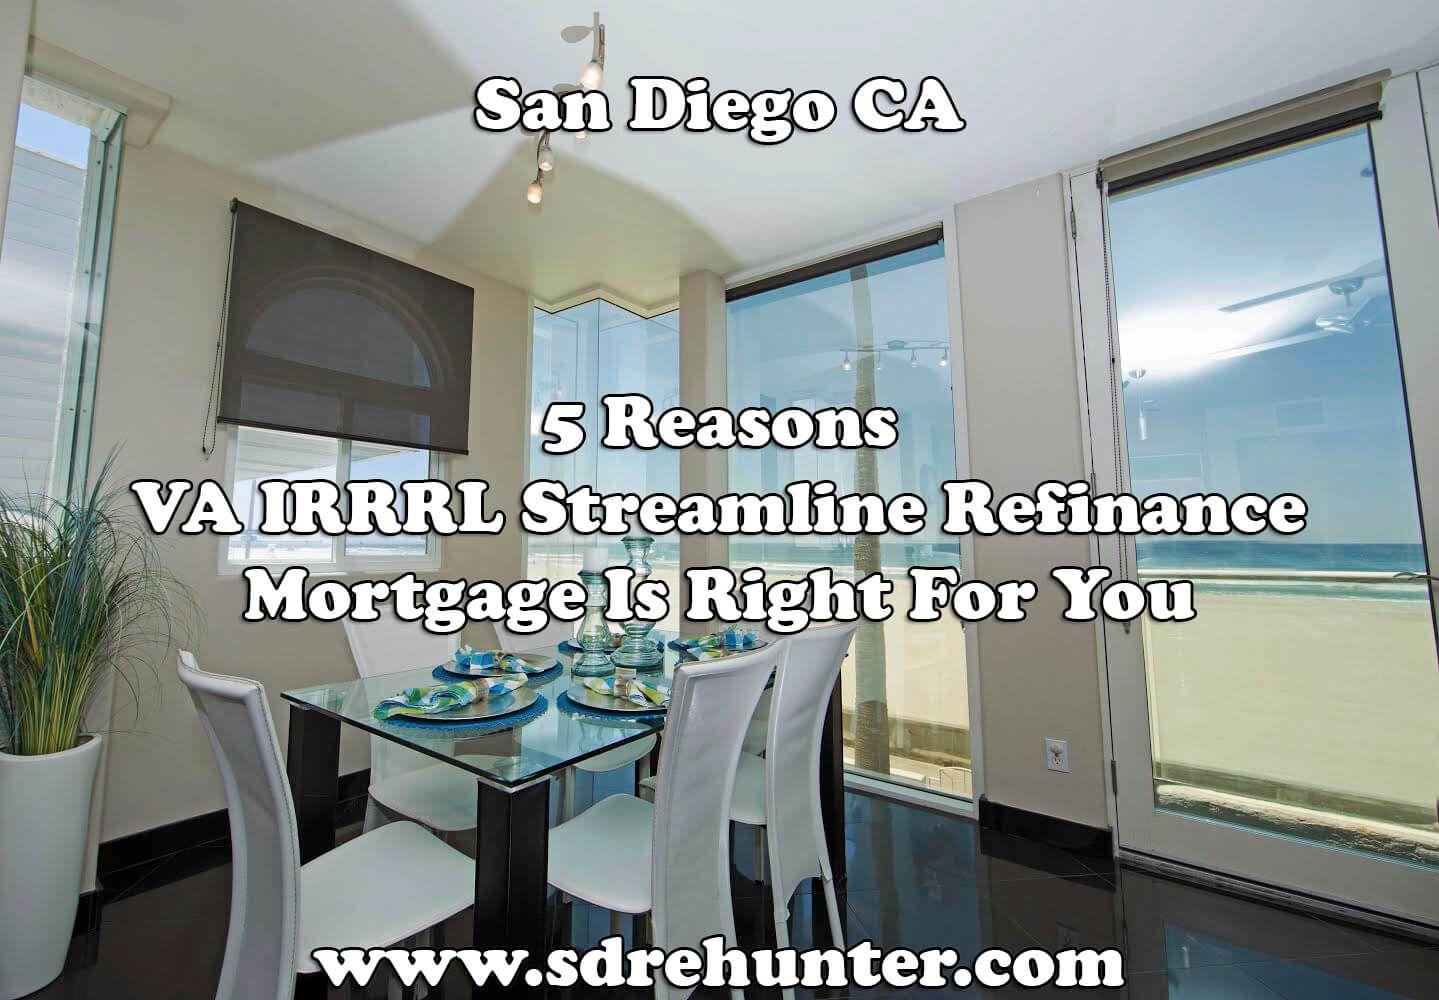 5 Reasons A Sango Va Irrrl Streamline Refinance